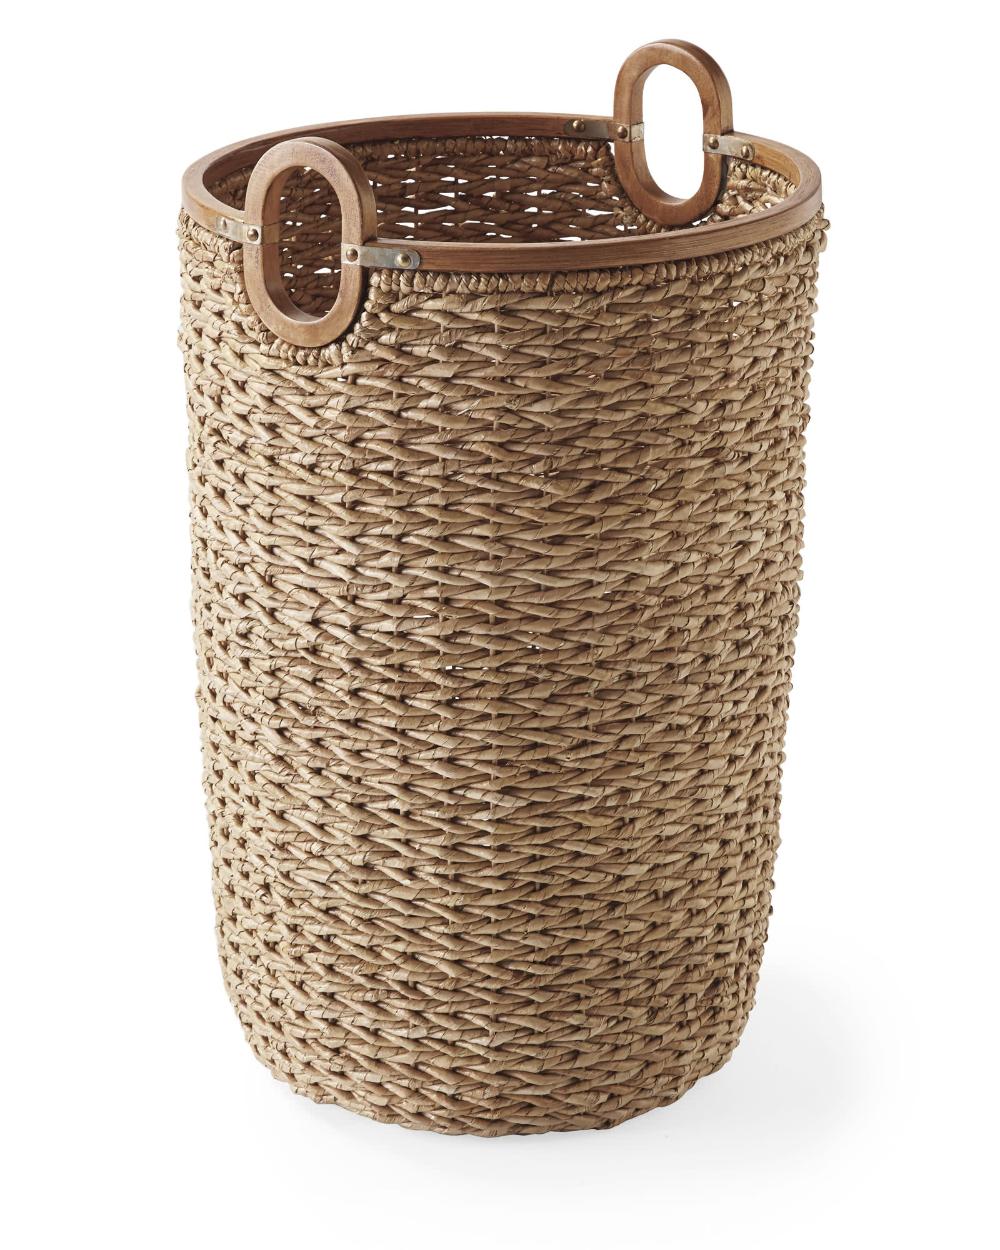 Seagrass Baskets Tall Laundry Basket Seagrass Basket Basket